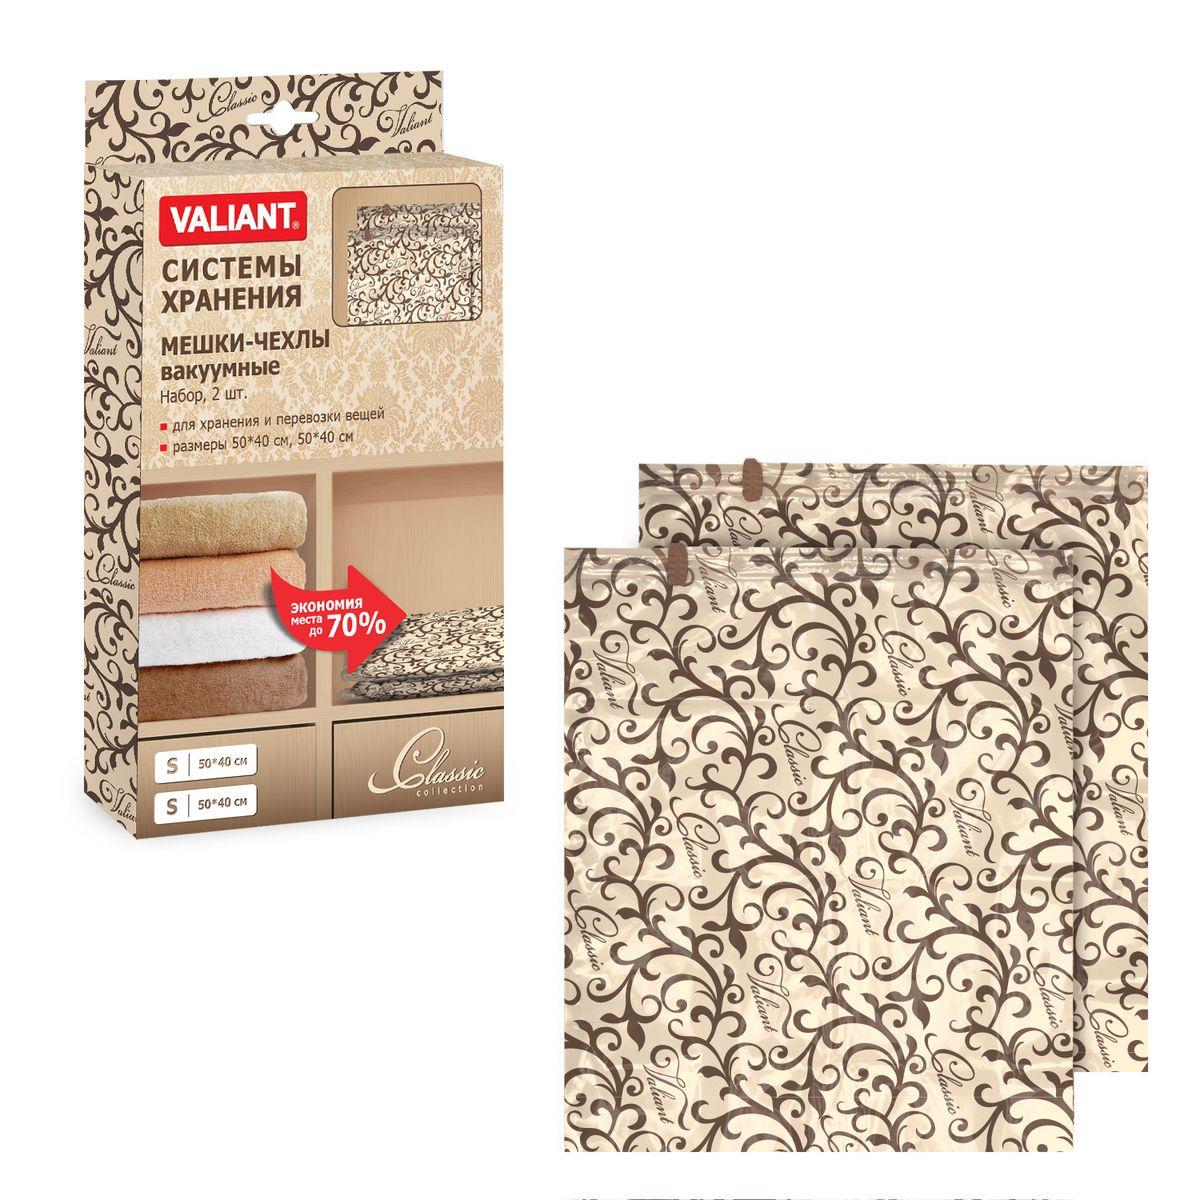 Набор чехлов для вакуумного хранения Valiant Classic, 50 х 40 см, 2 штCL-VS-54